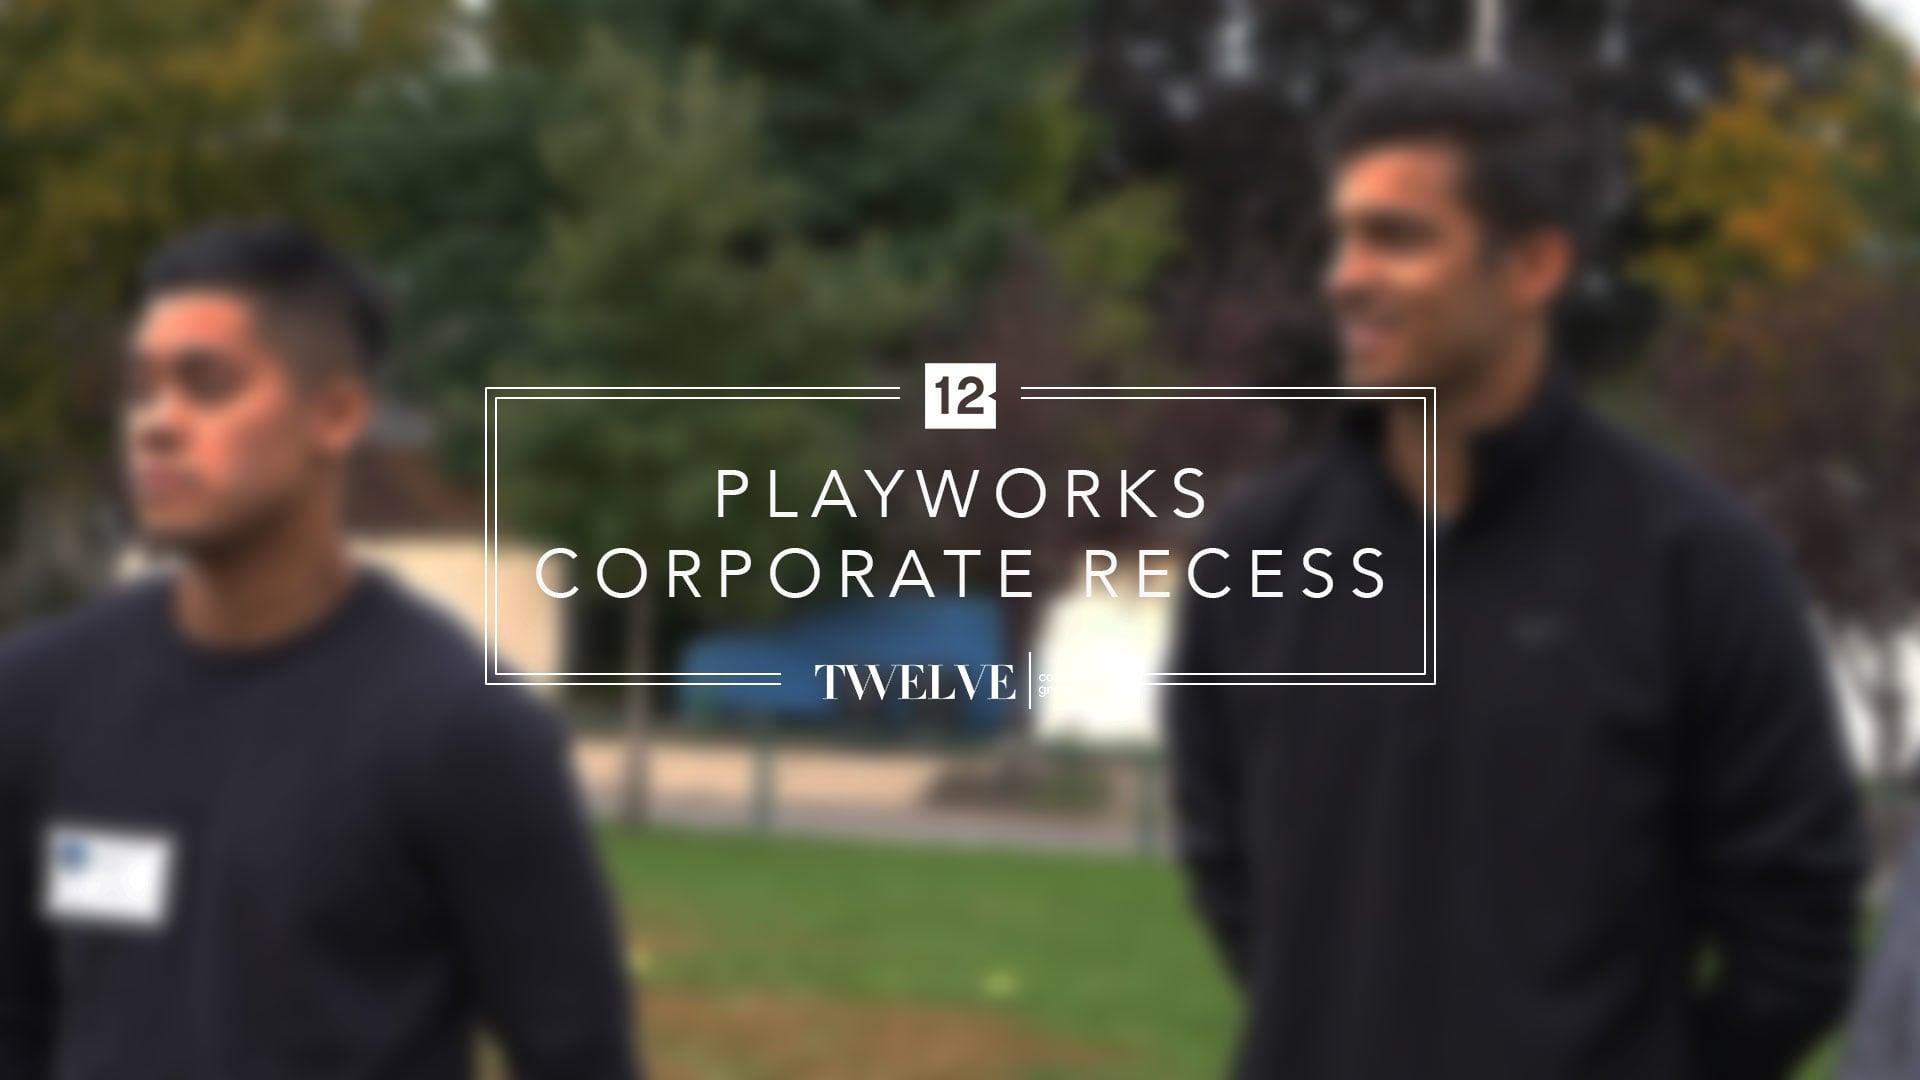 Playworks Corporate Recess